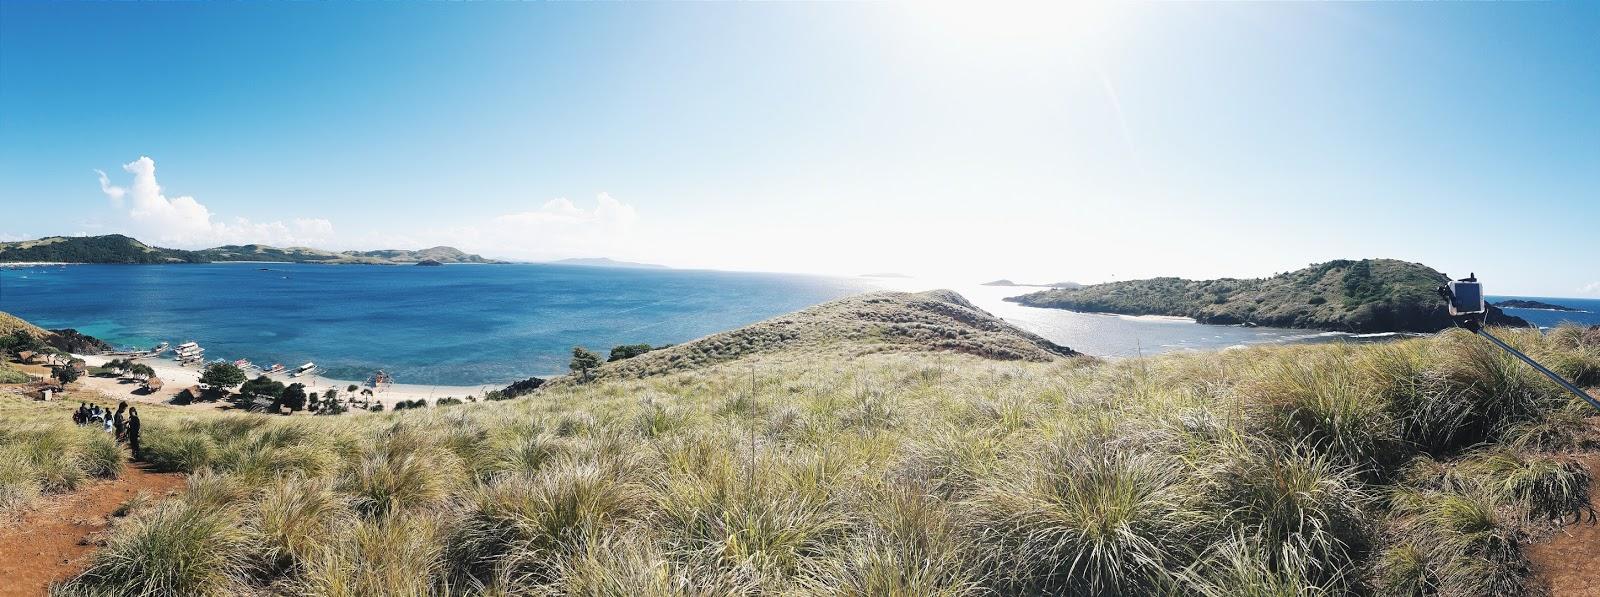 Calaguas Island: An escape from the city noise   KE∆ ORTEG